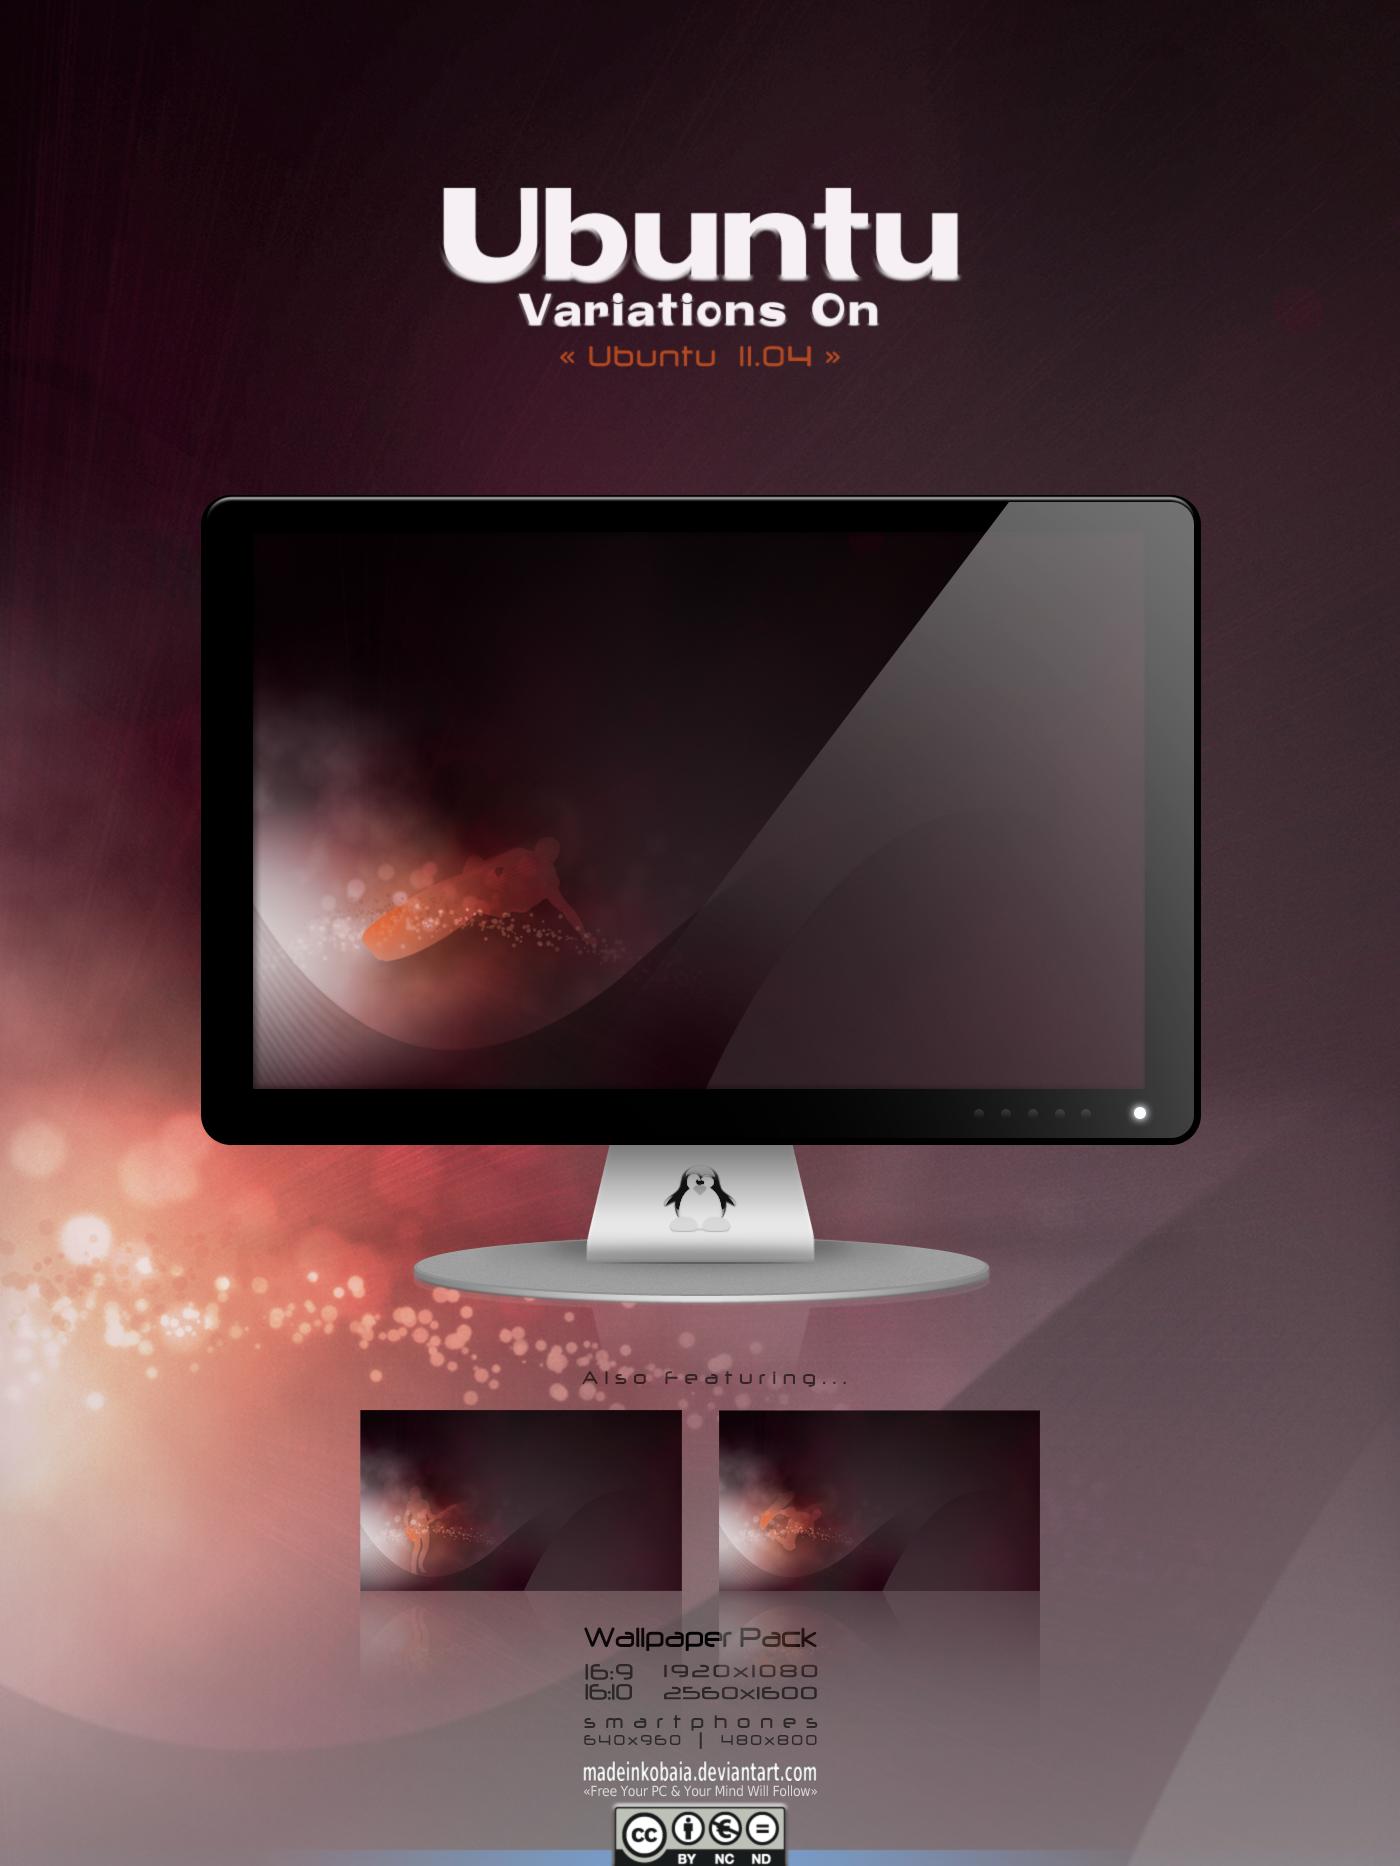 Variations On Ubuntu 11.04 1+ by MadeInKobaia